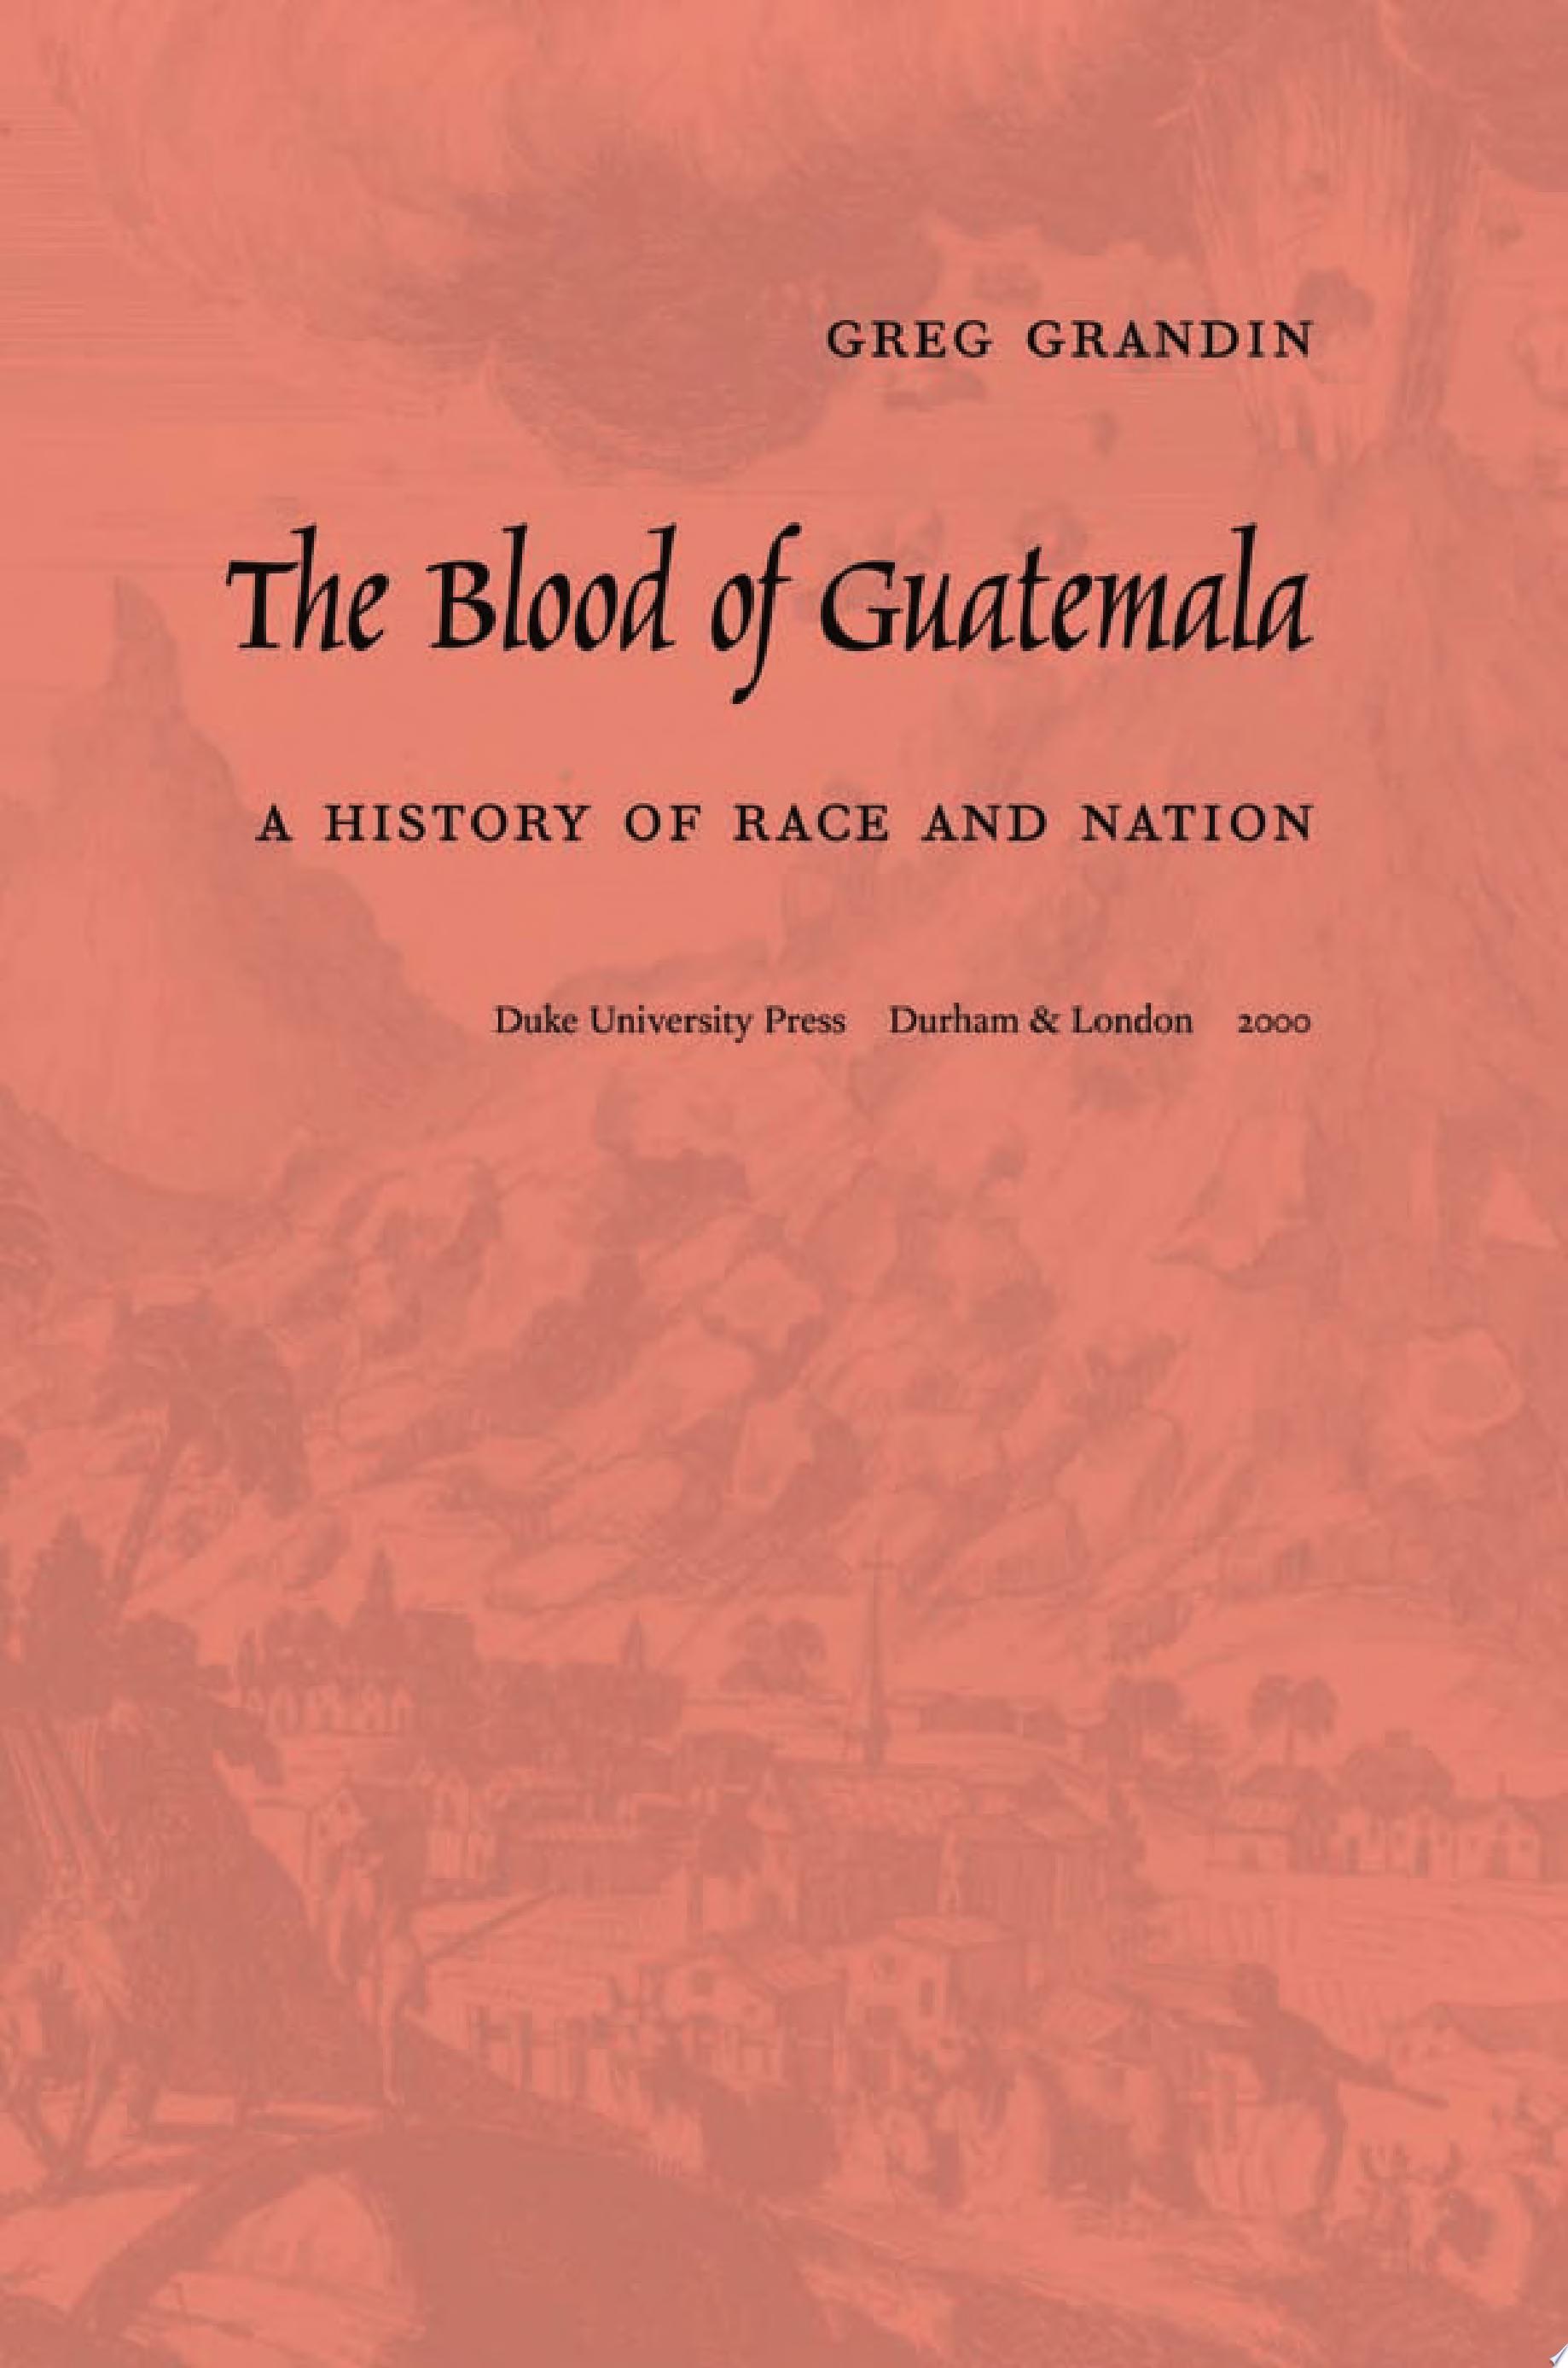 The Blood of Guatemala